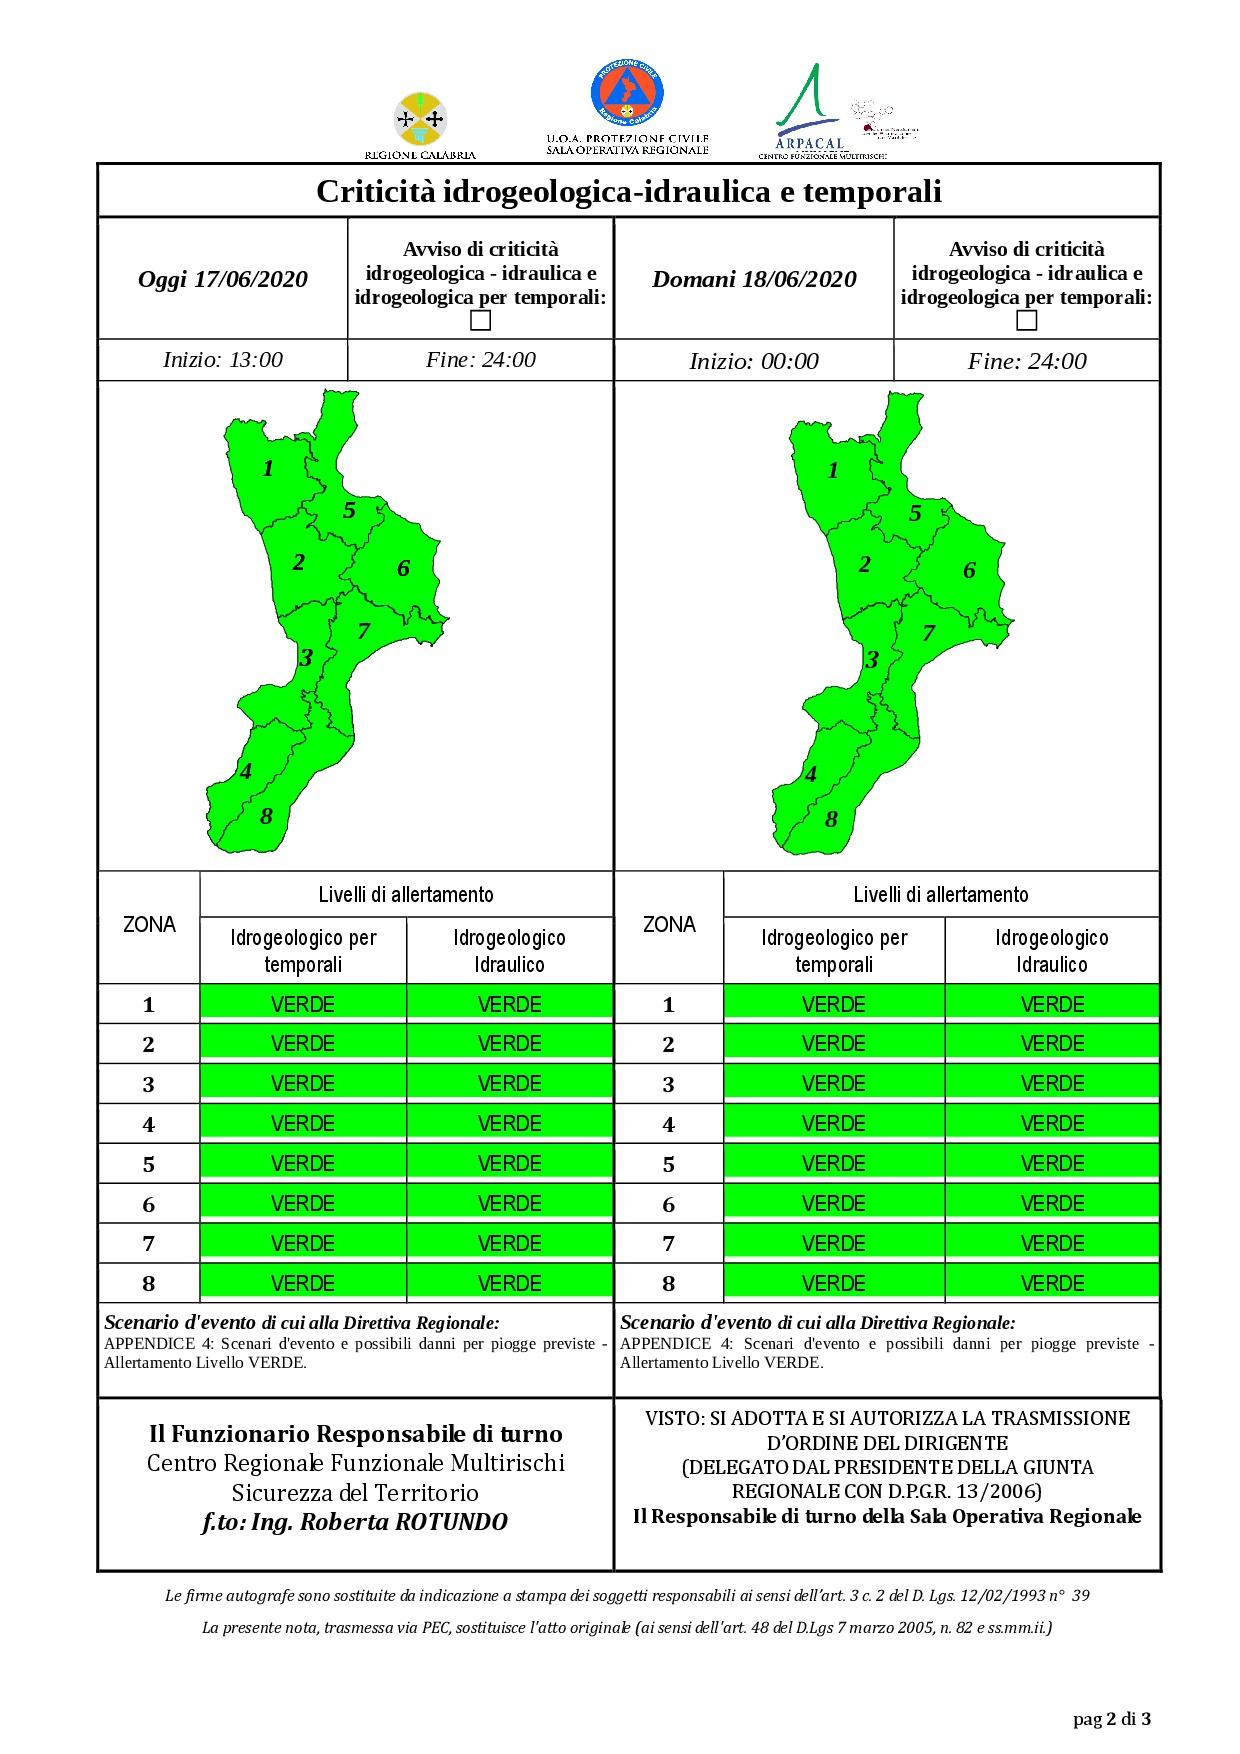 Criticità idrogeologica-idraulica e temporali in Calabria 17-06-2020